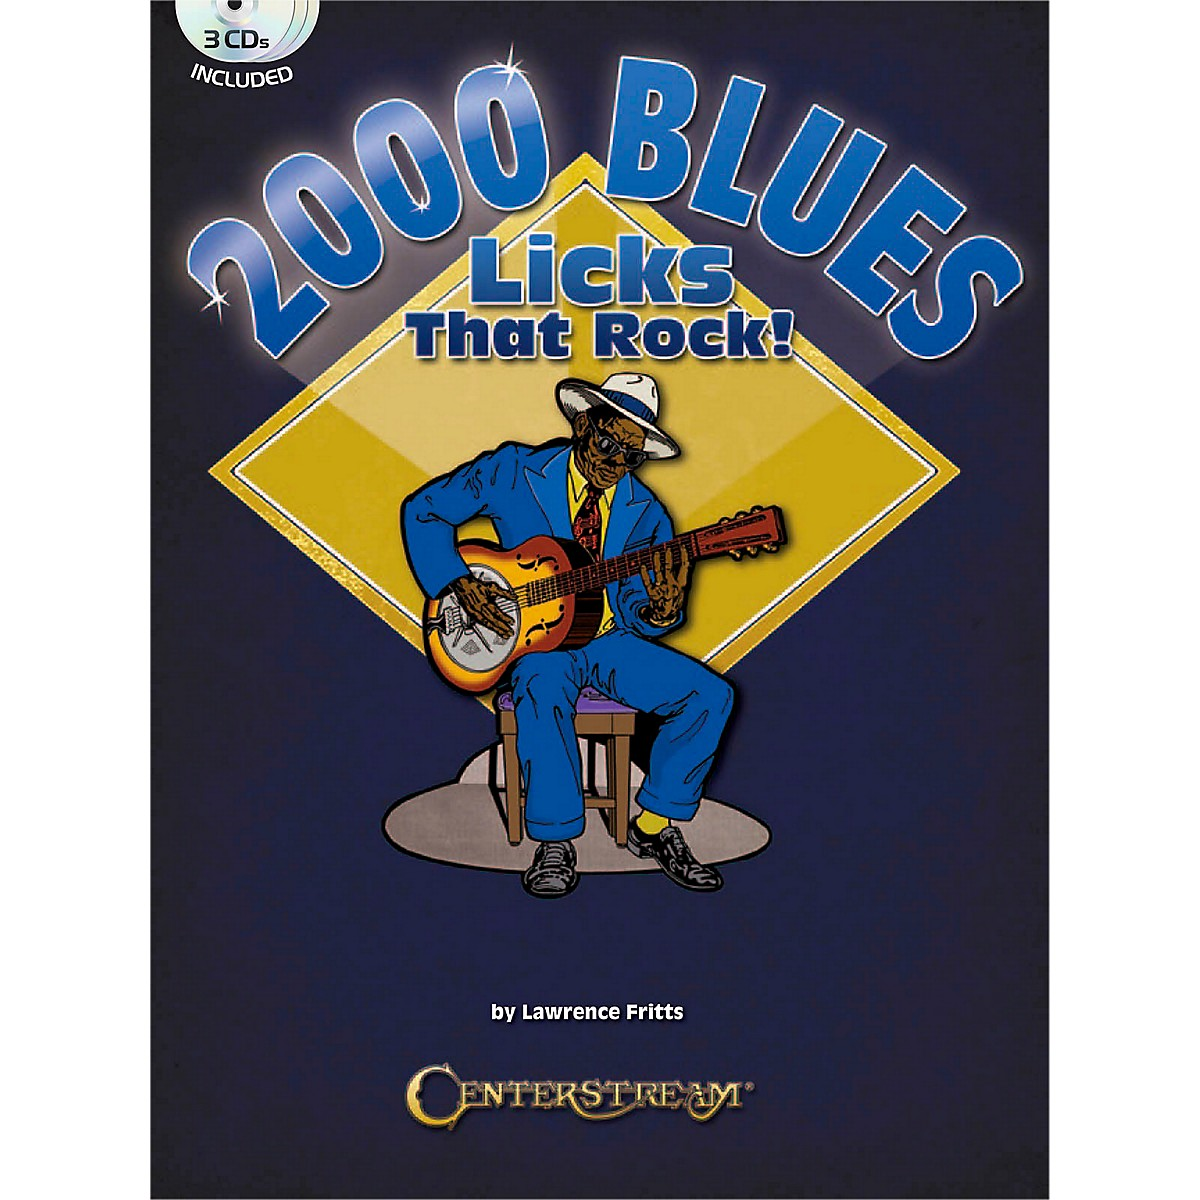 Centerstream Publishing 2000 Blues Licks That Rock Book/3CDs